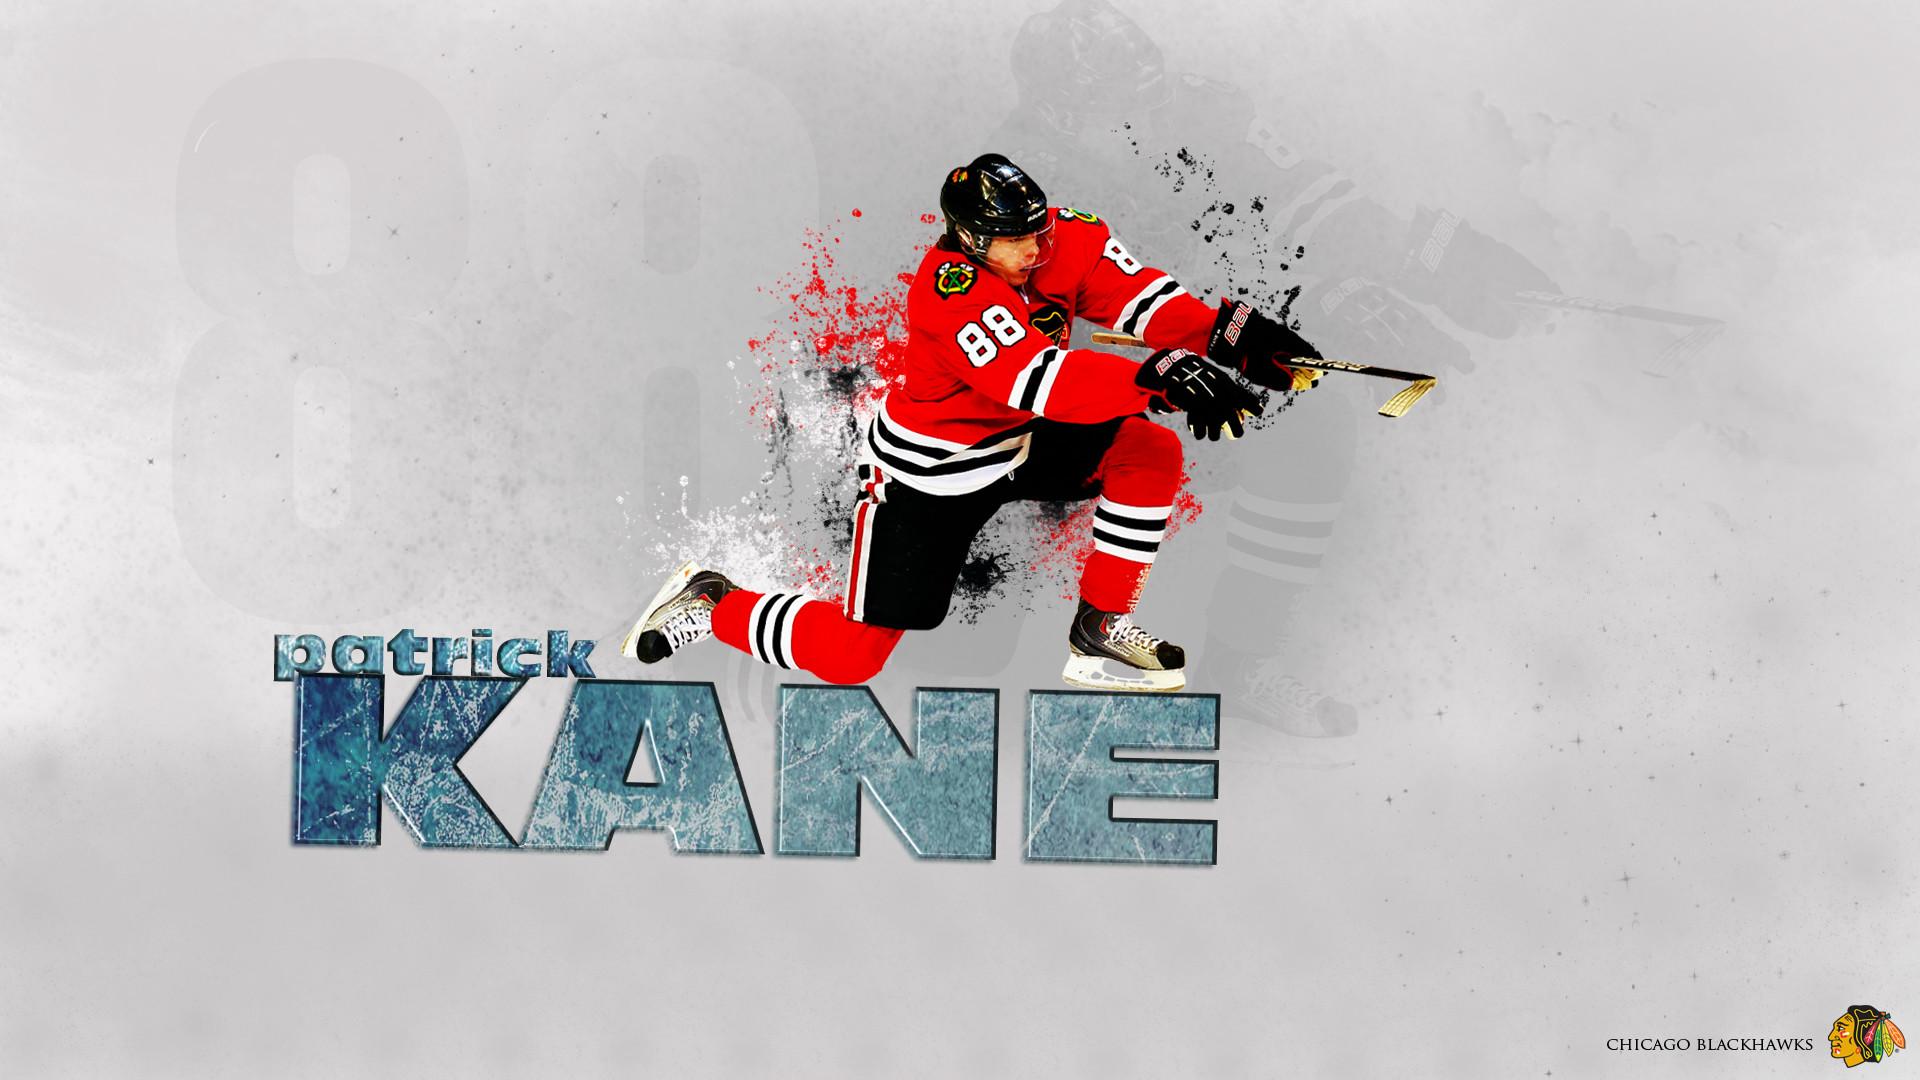 Hockey Chicago Blackhawks Patrick Kane wallpaper | | 128663 .